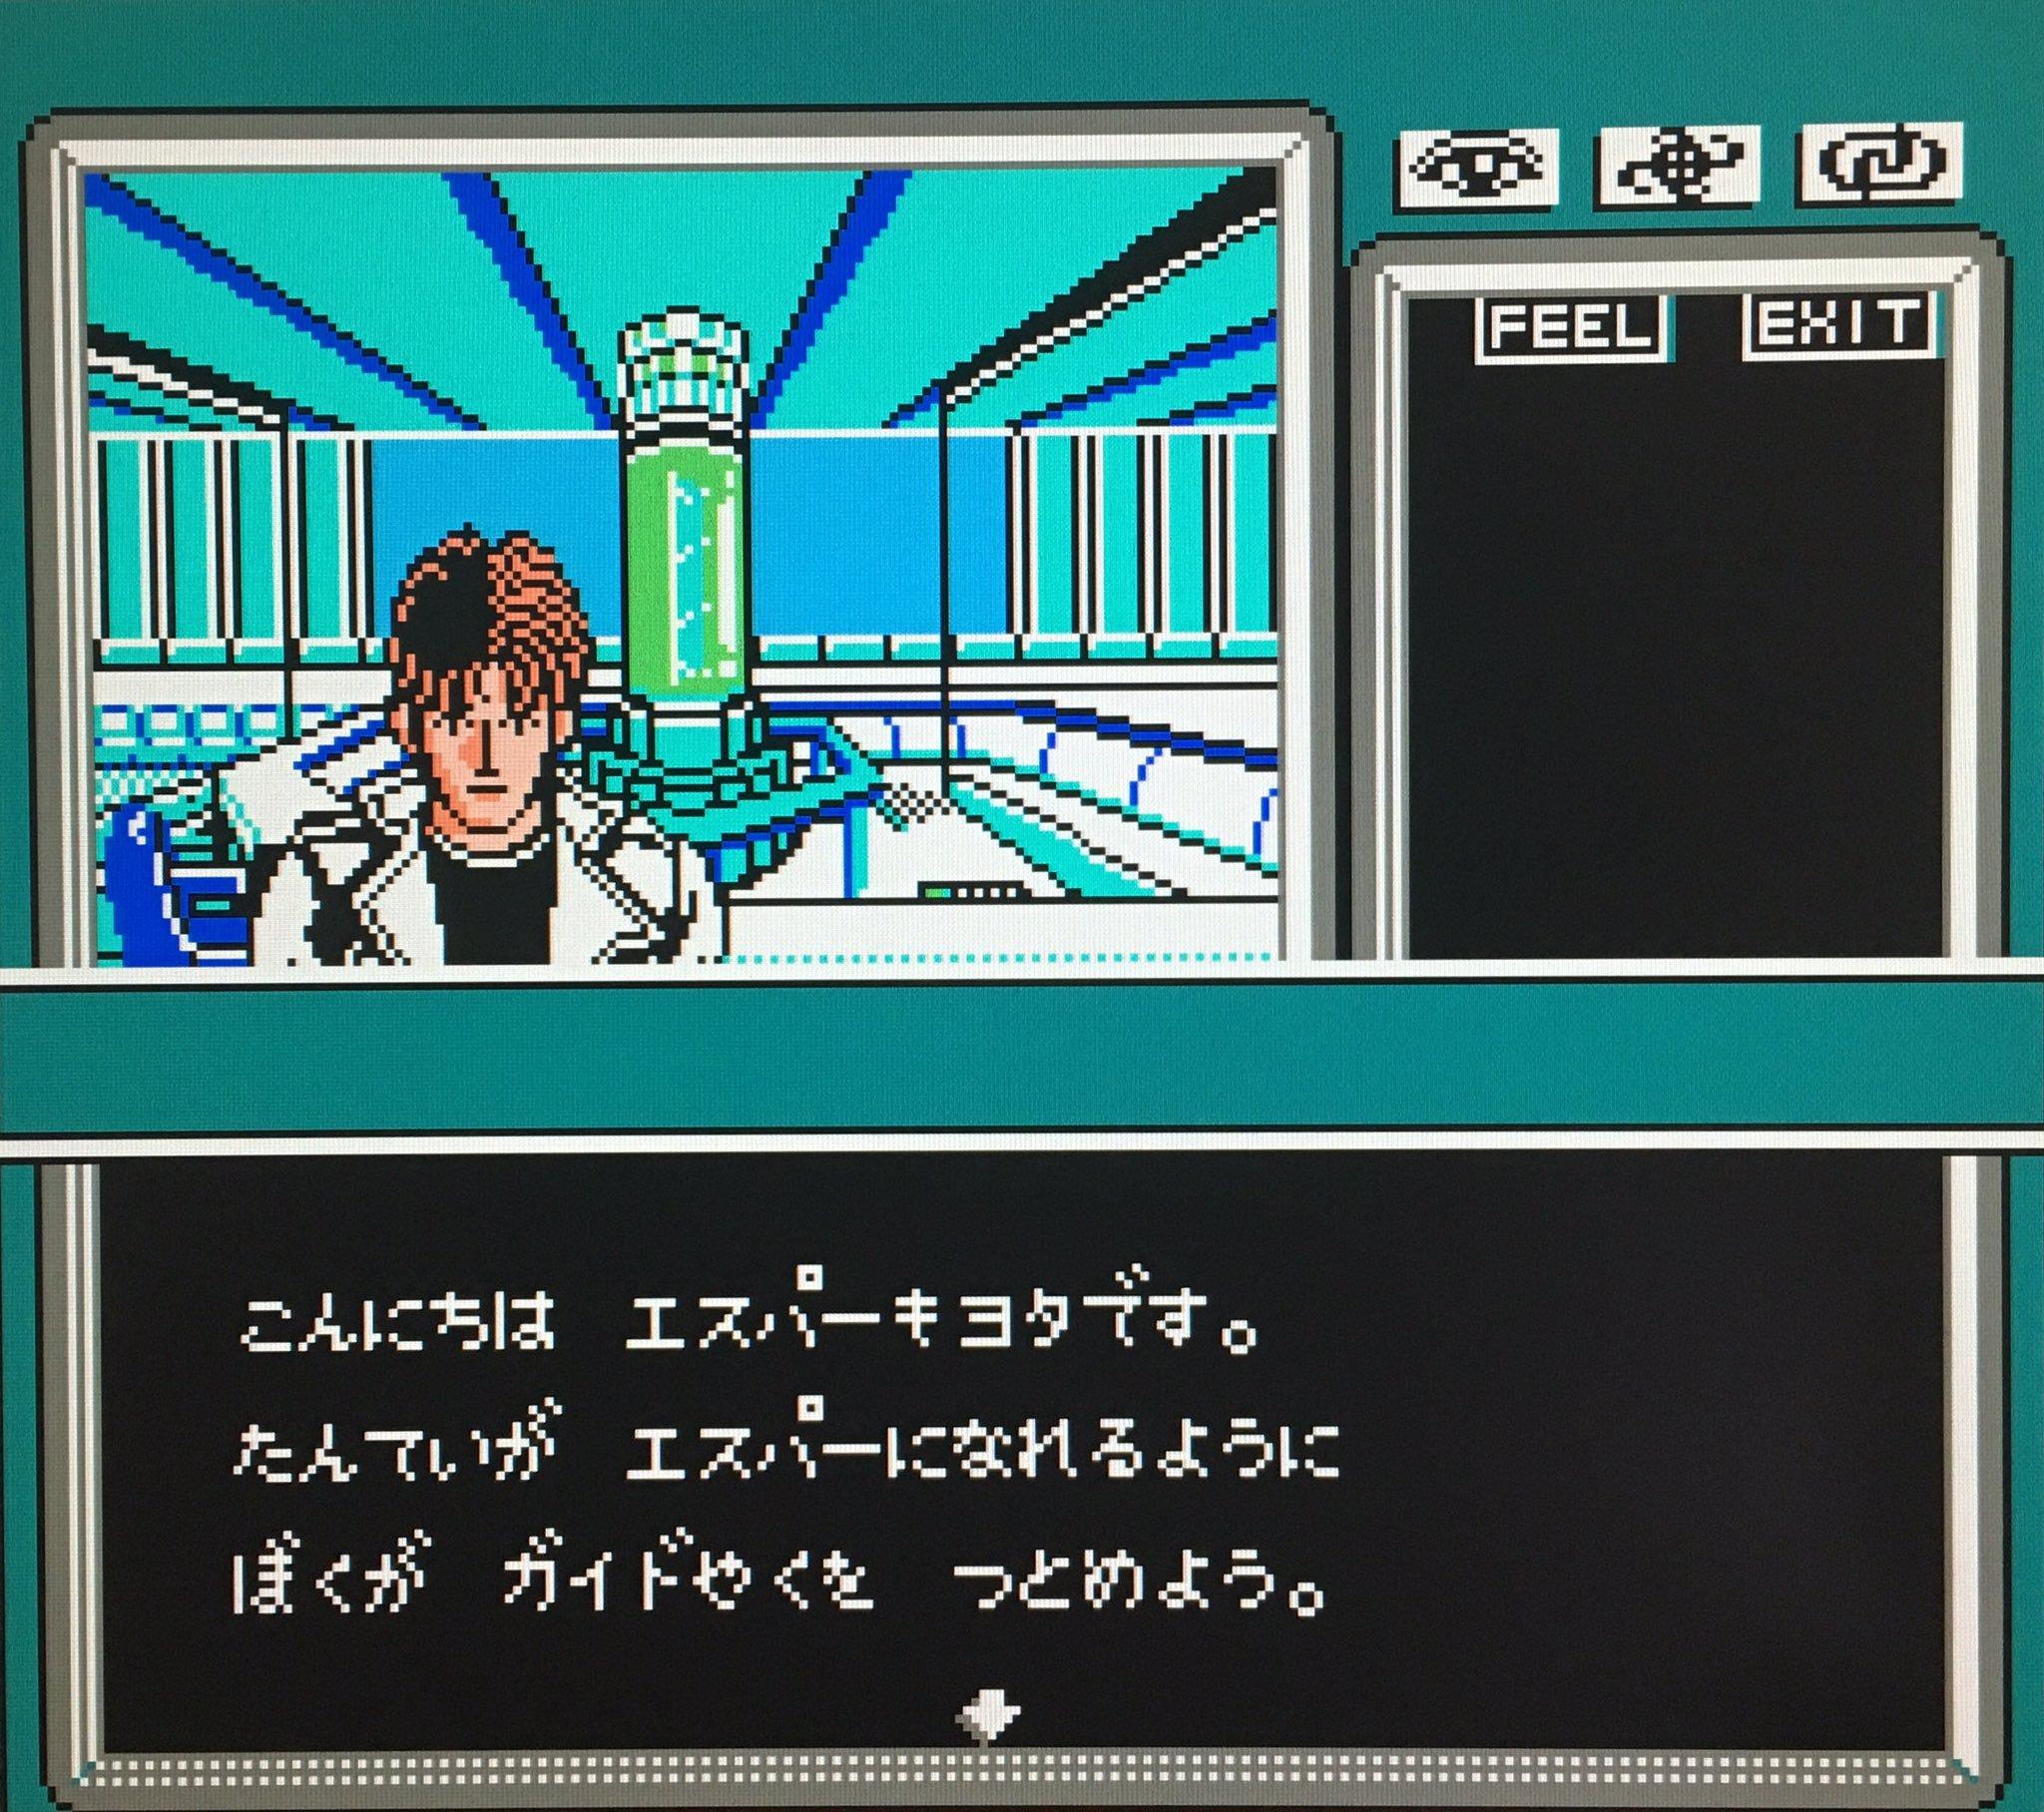 D4b87ydUwAAia2C - 世界一難しいと思うゲーム挙げろ